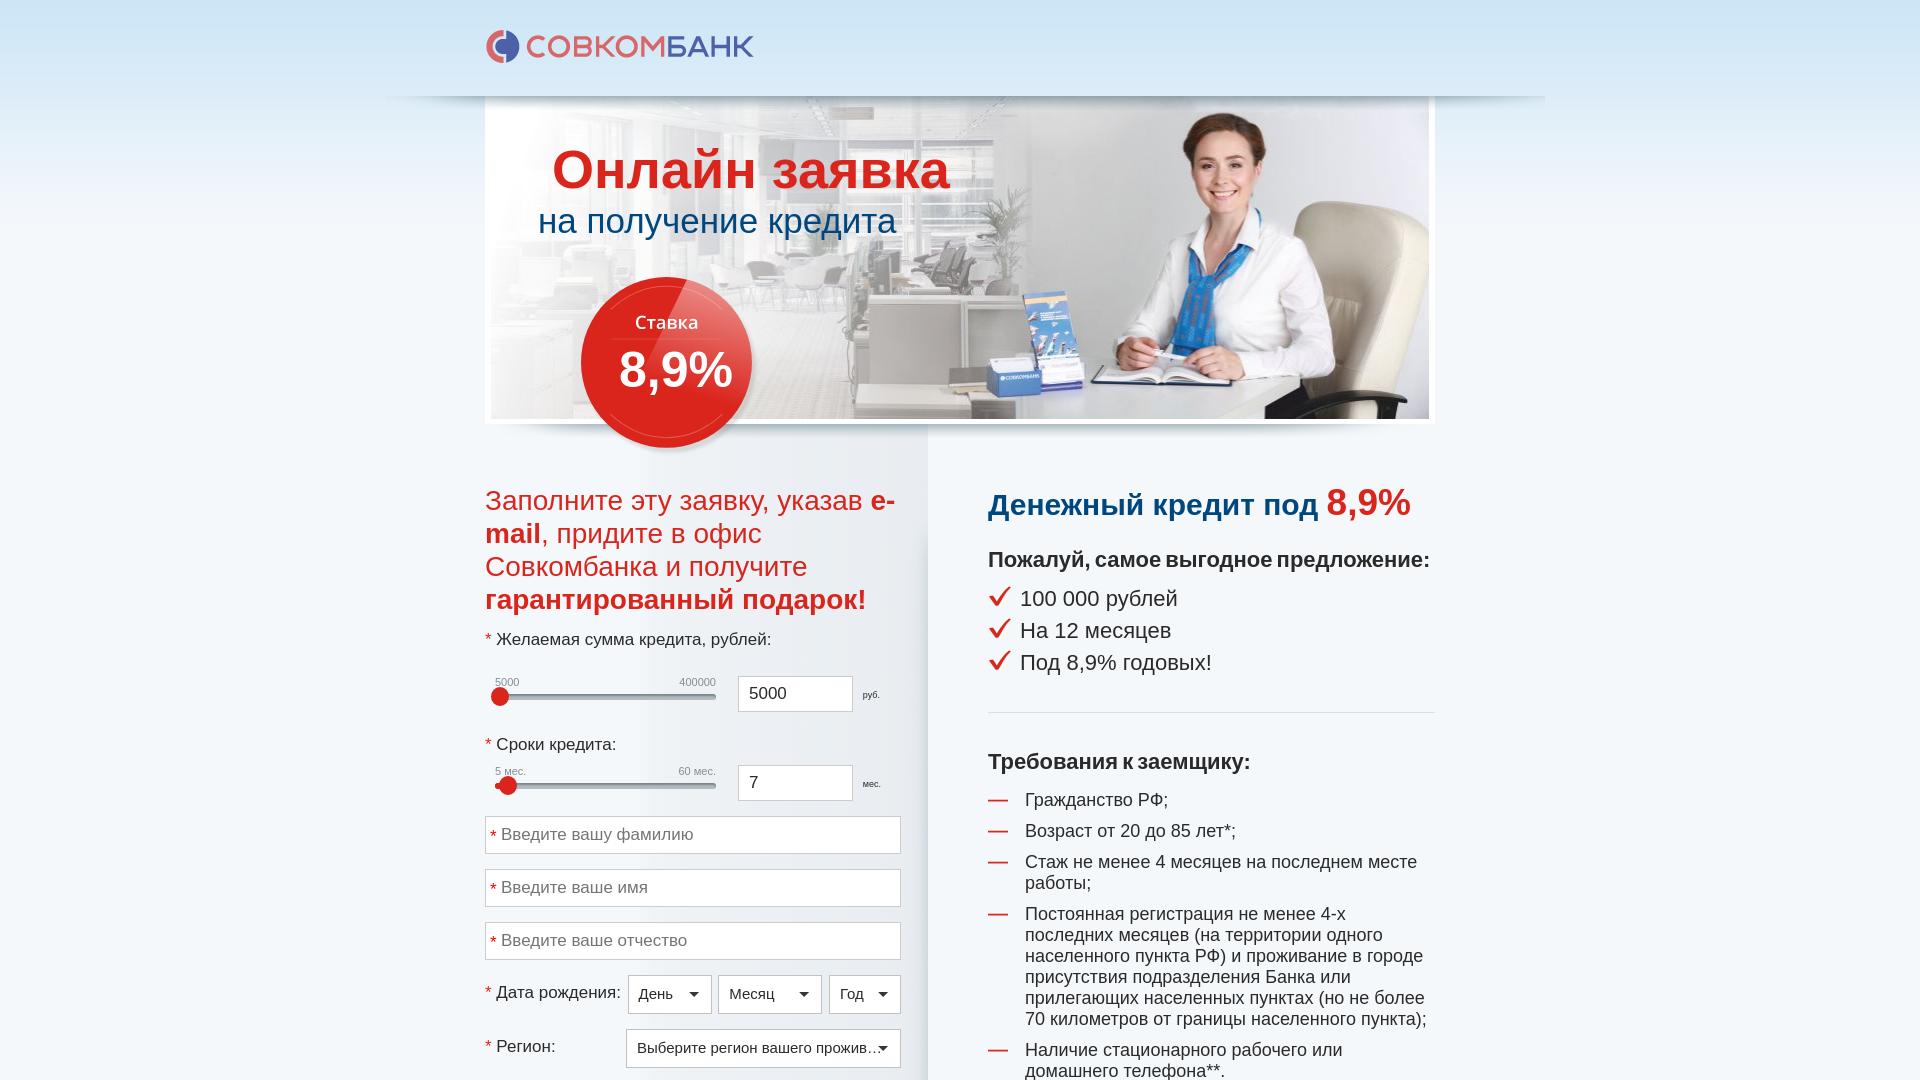 Совкомбанк [CPS] RU website